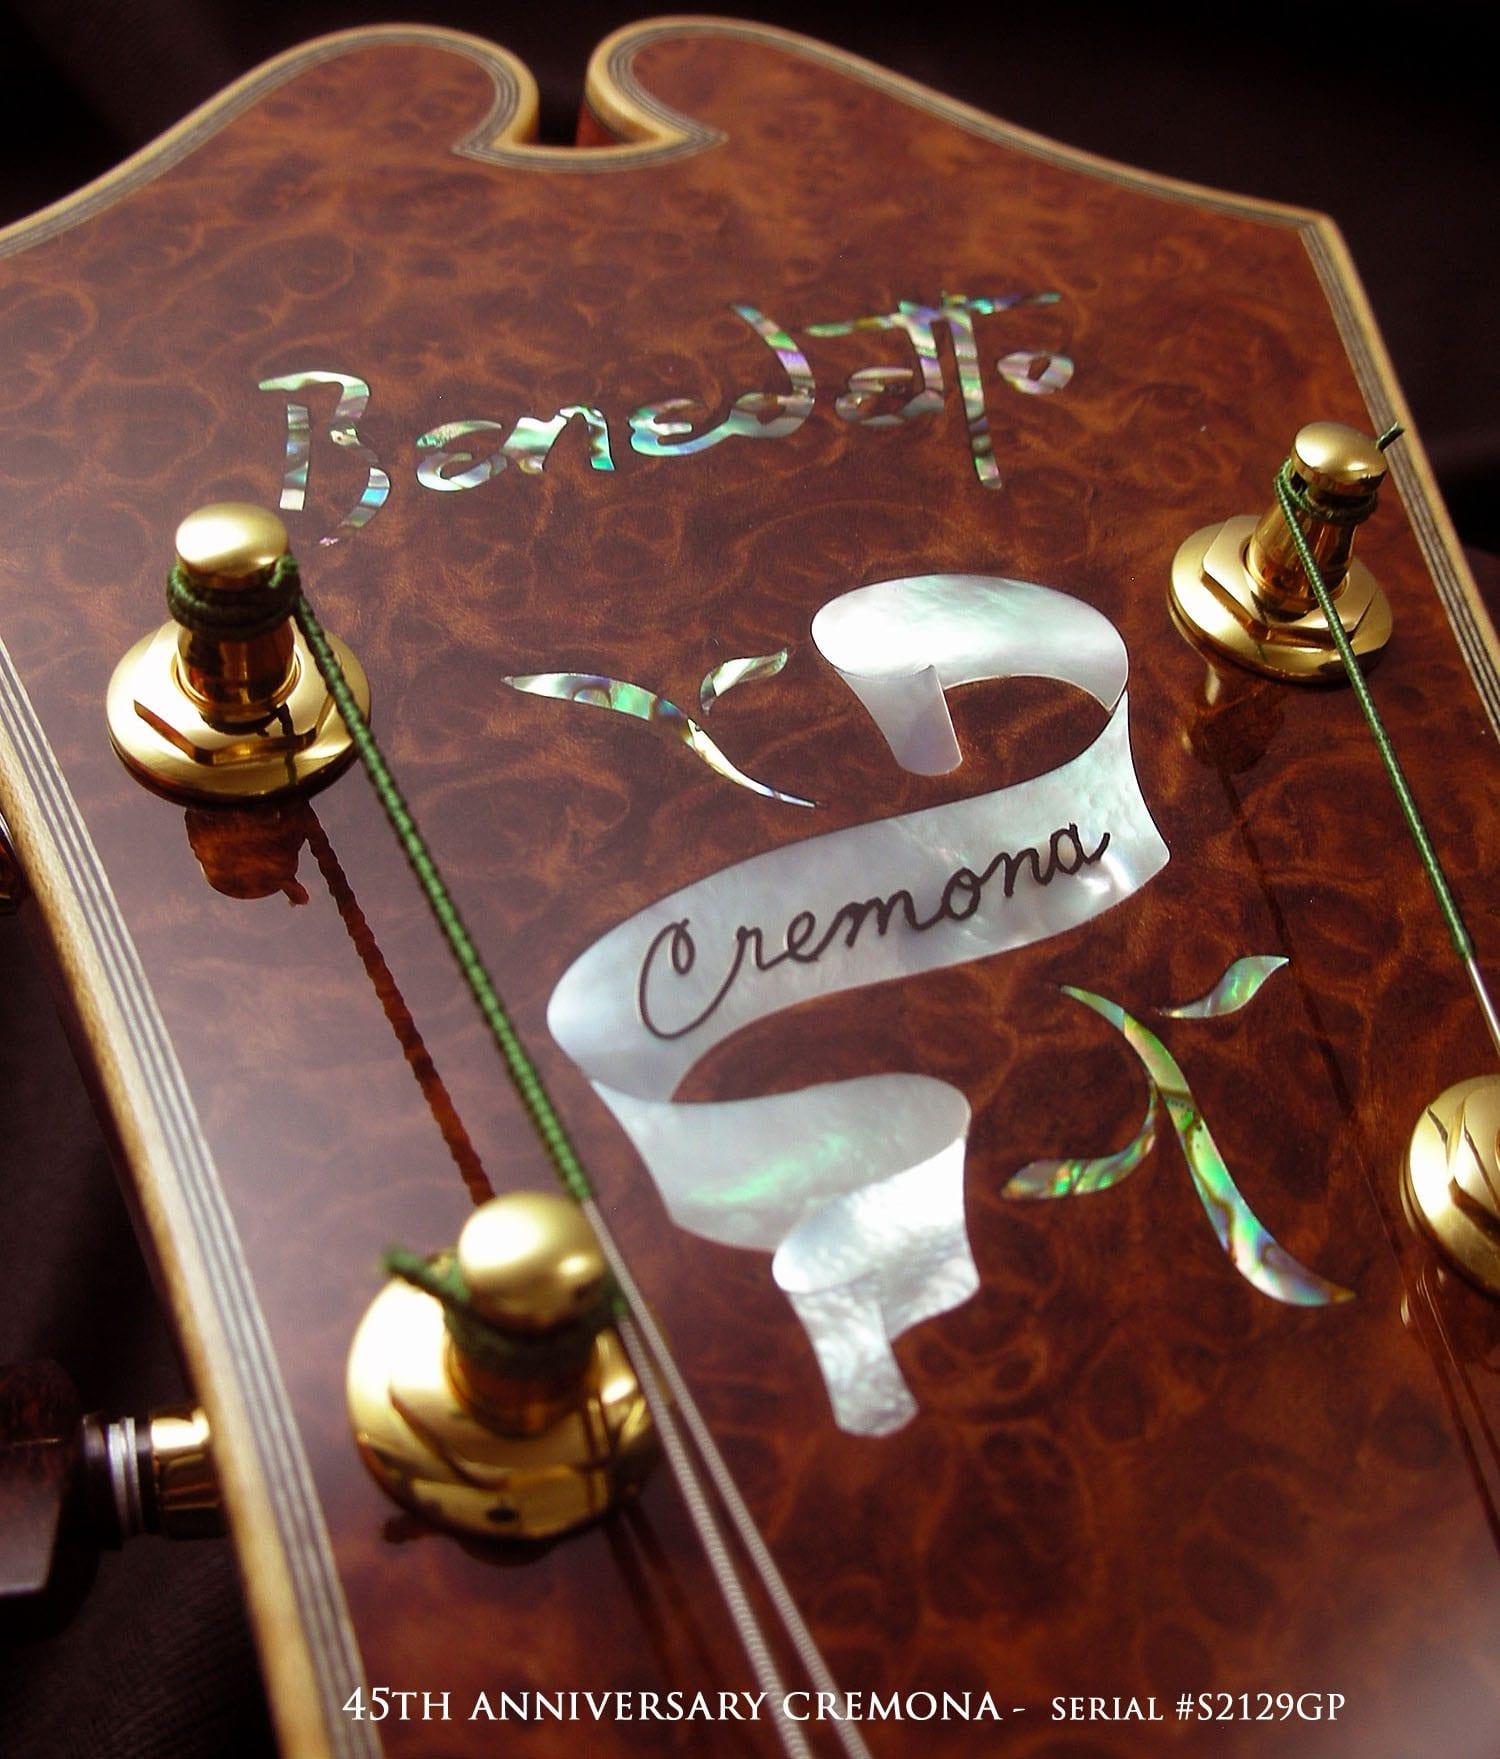 Visual Appearances of Headstocks-benedetto-45th-anniversary-cremona-serial-s2129gp-headstock-closeup-photo-stephanie-ward-jpg